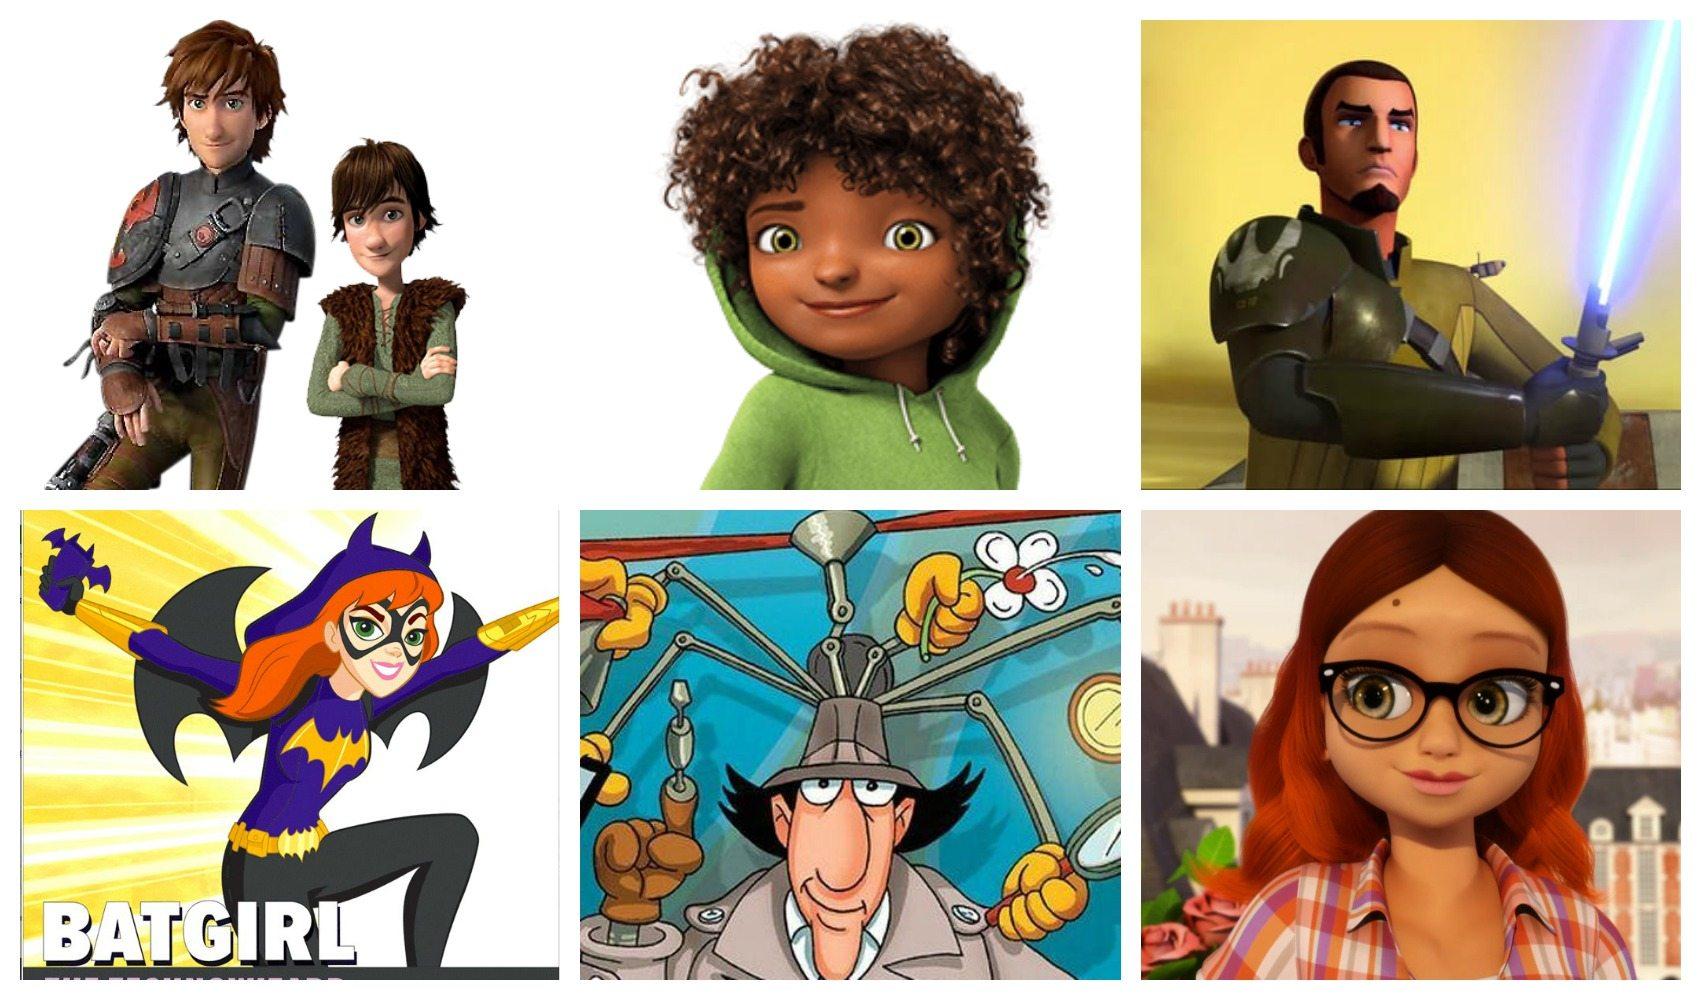 Smart Kind Characters in children's media